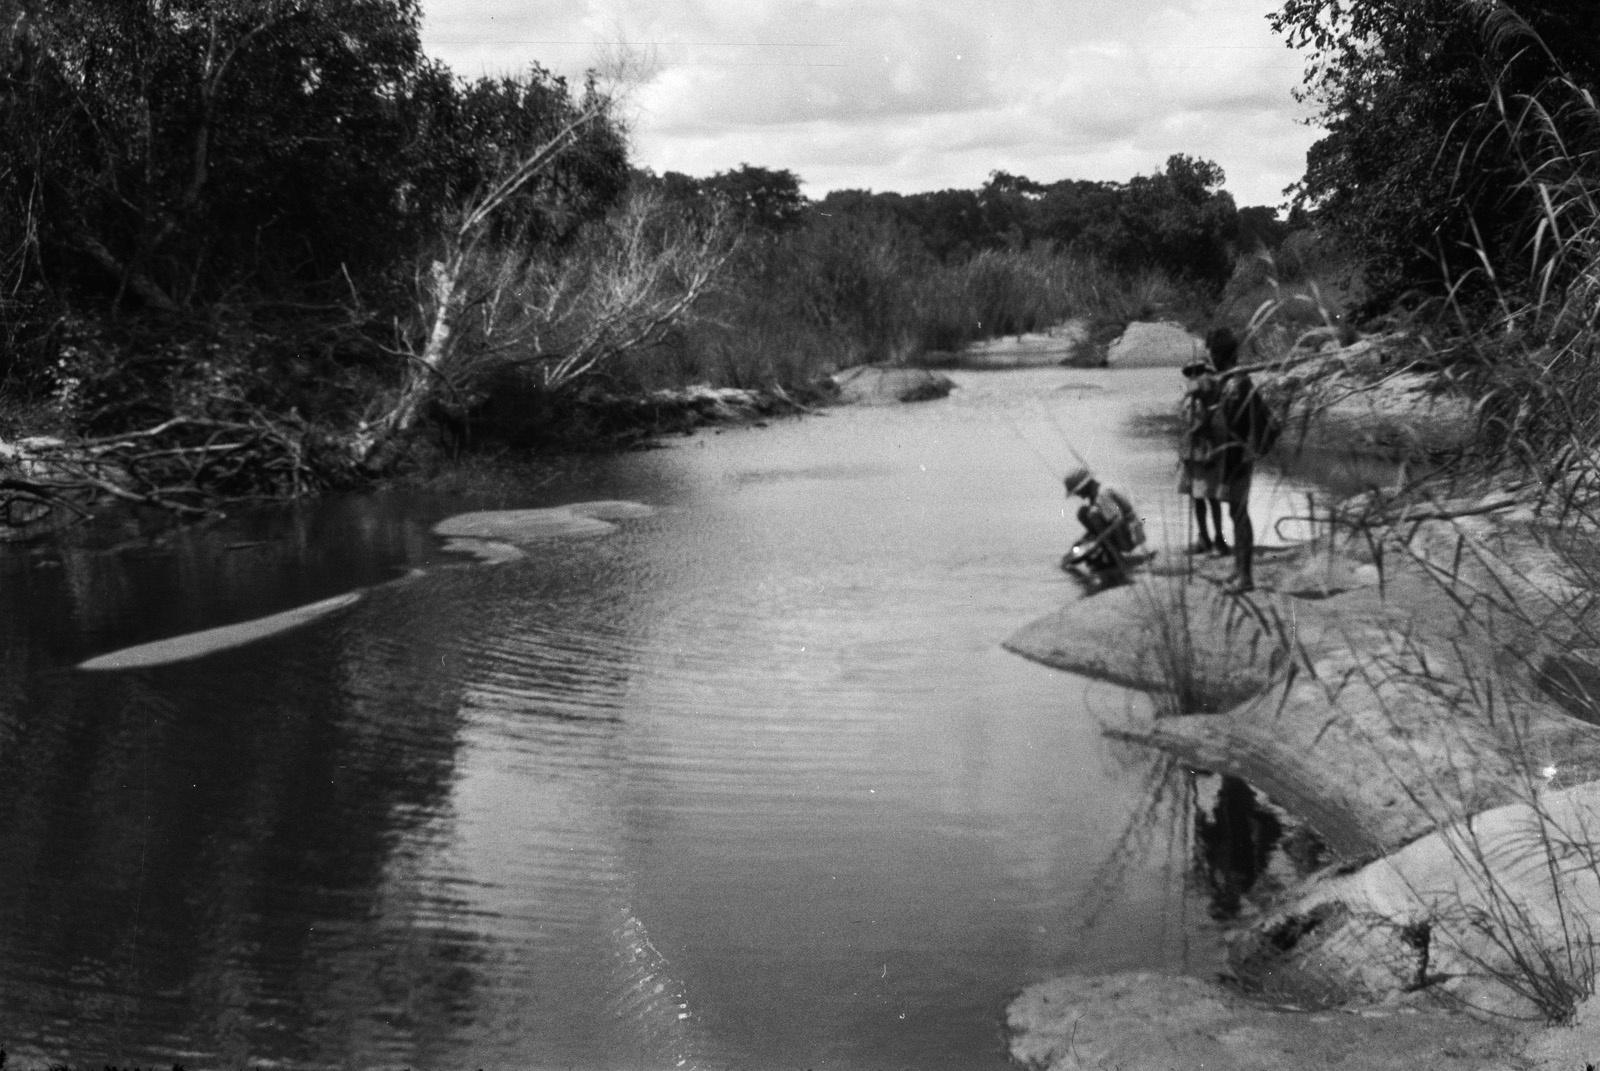 Между Капири Мпоши и рекой Лунсемфва. Исследователь Эрнст Акерманн на берегу реки Лунсемфва во время взятия проб